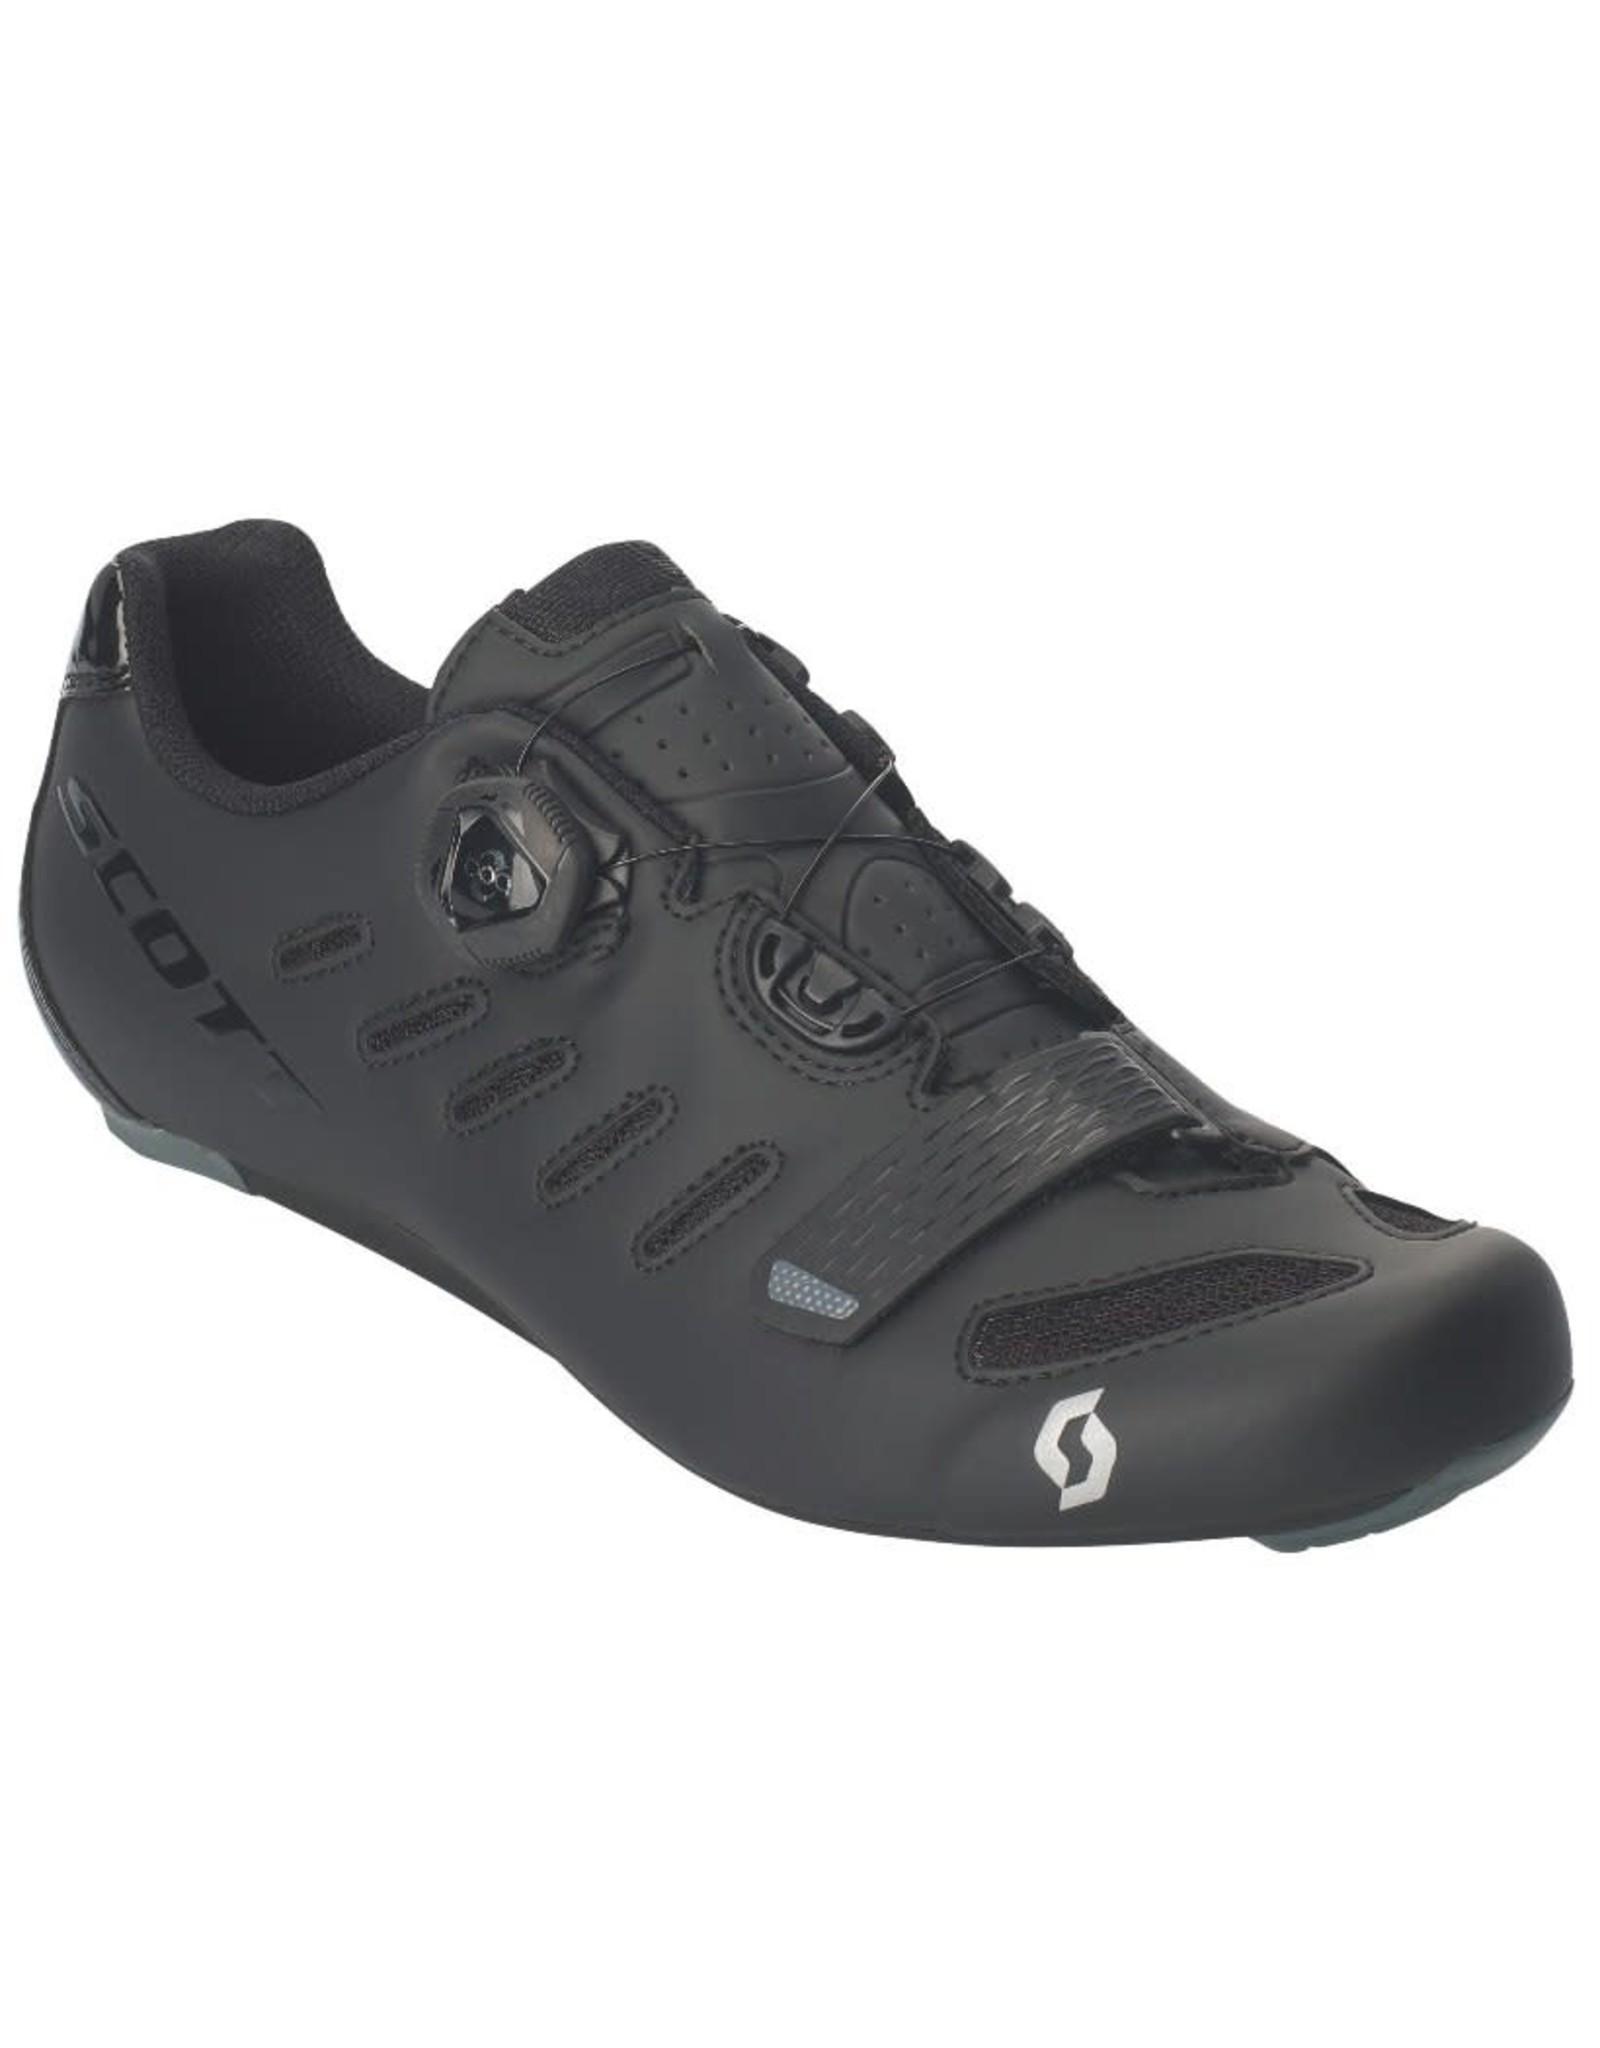 Scott Scott Road Team BOA Shoe, Mens